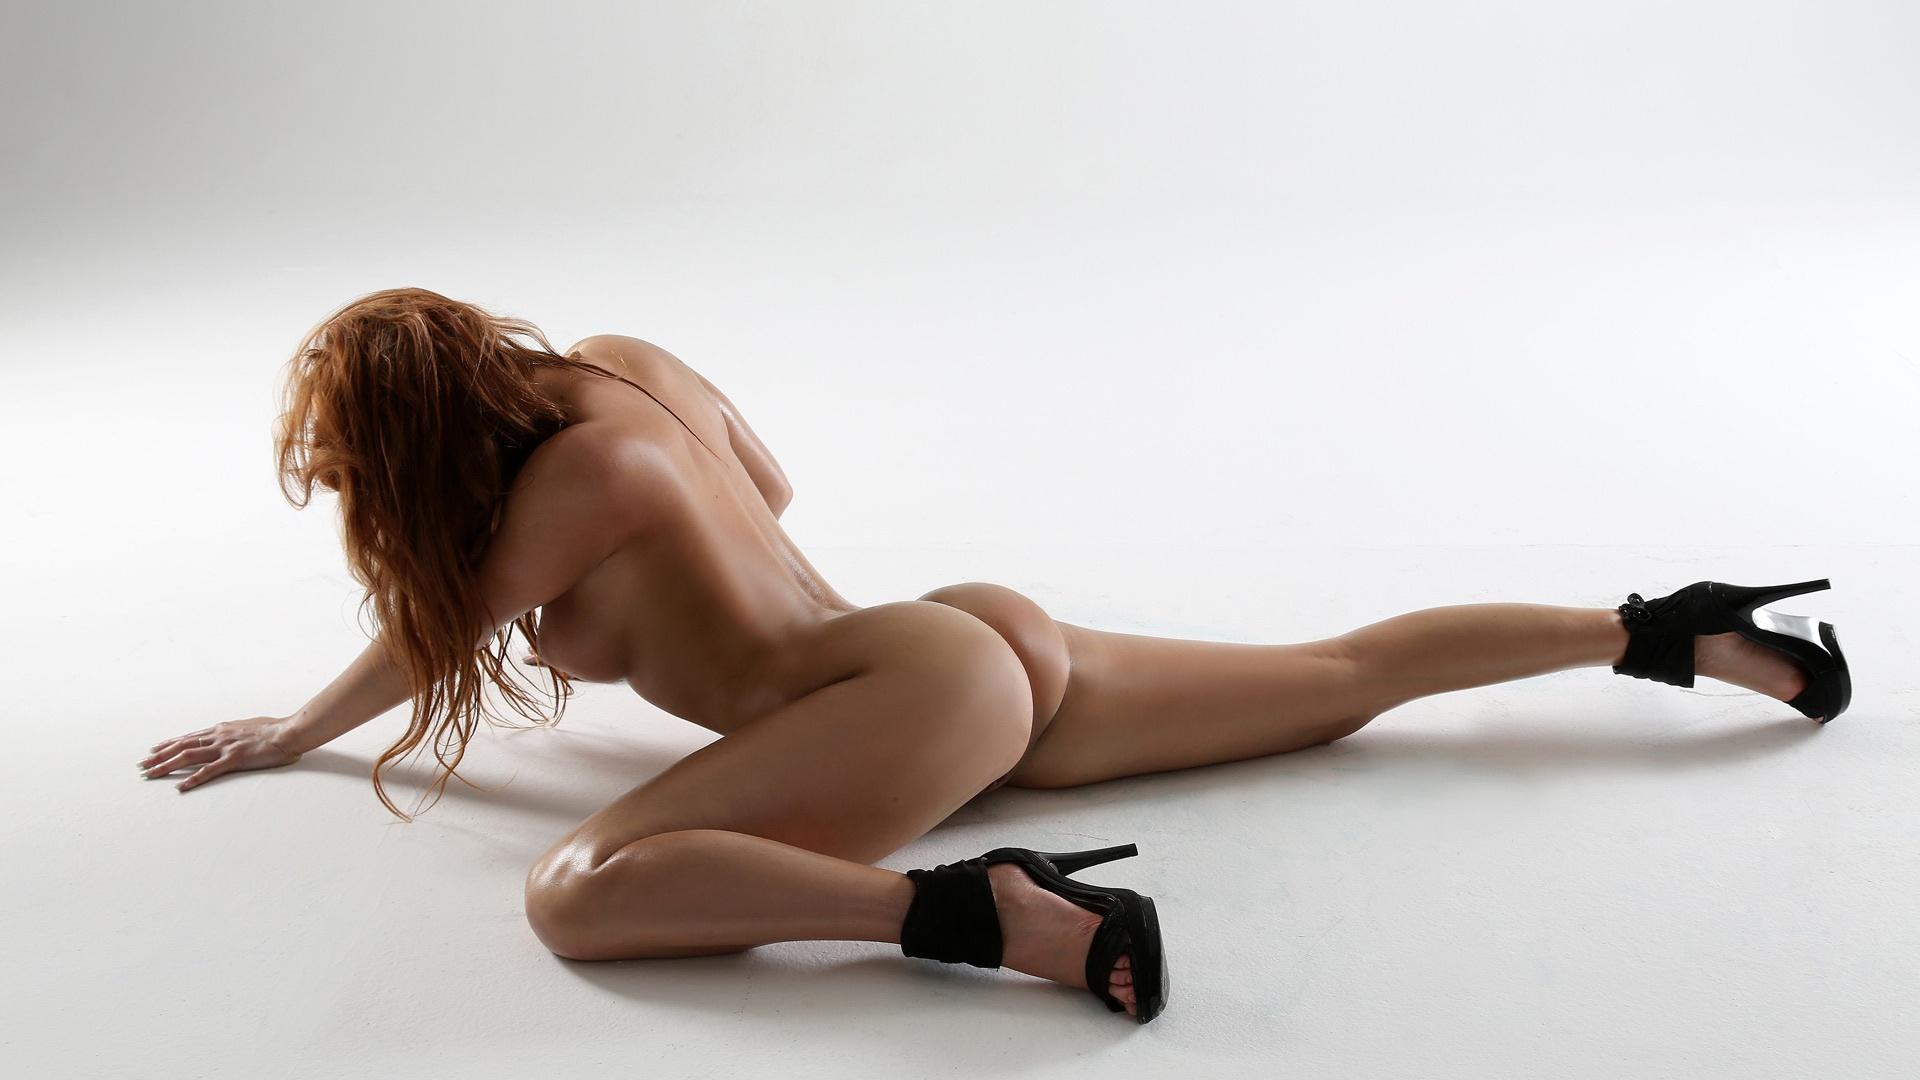 Erotic glamours models